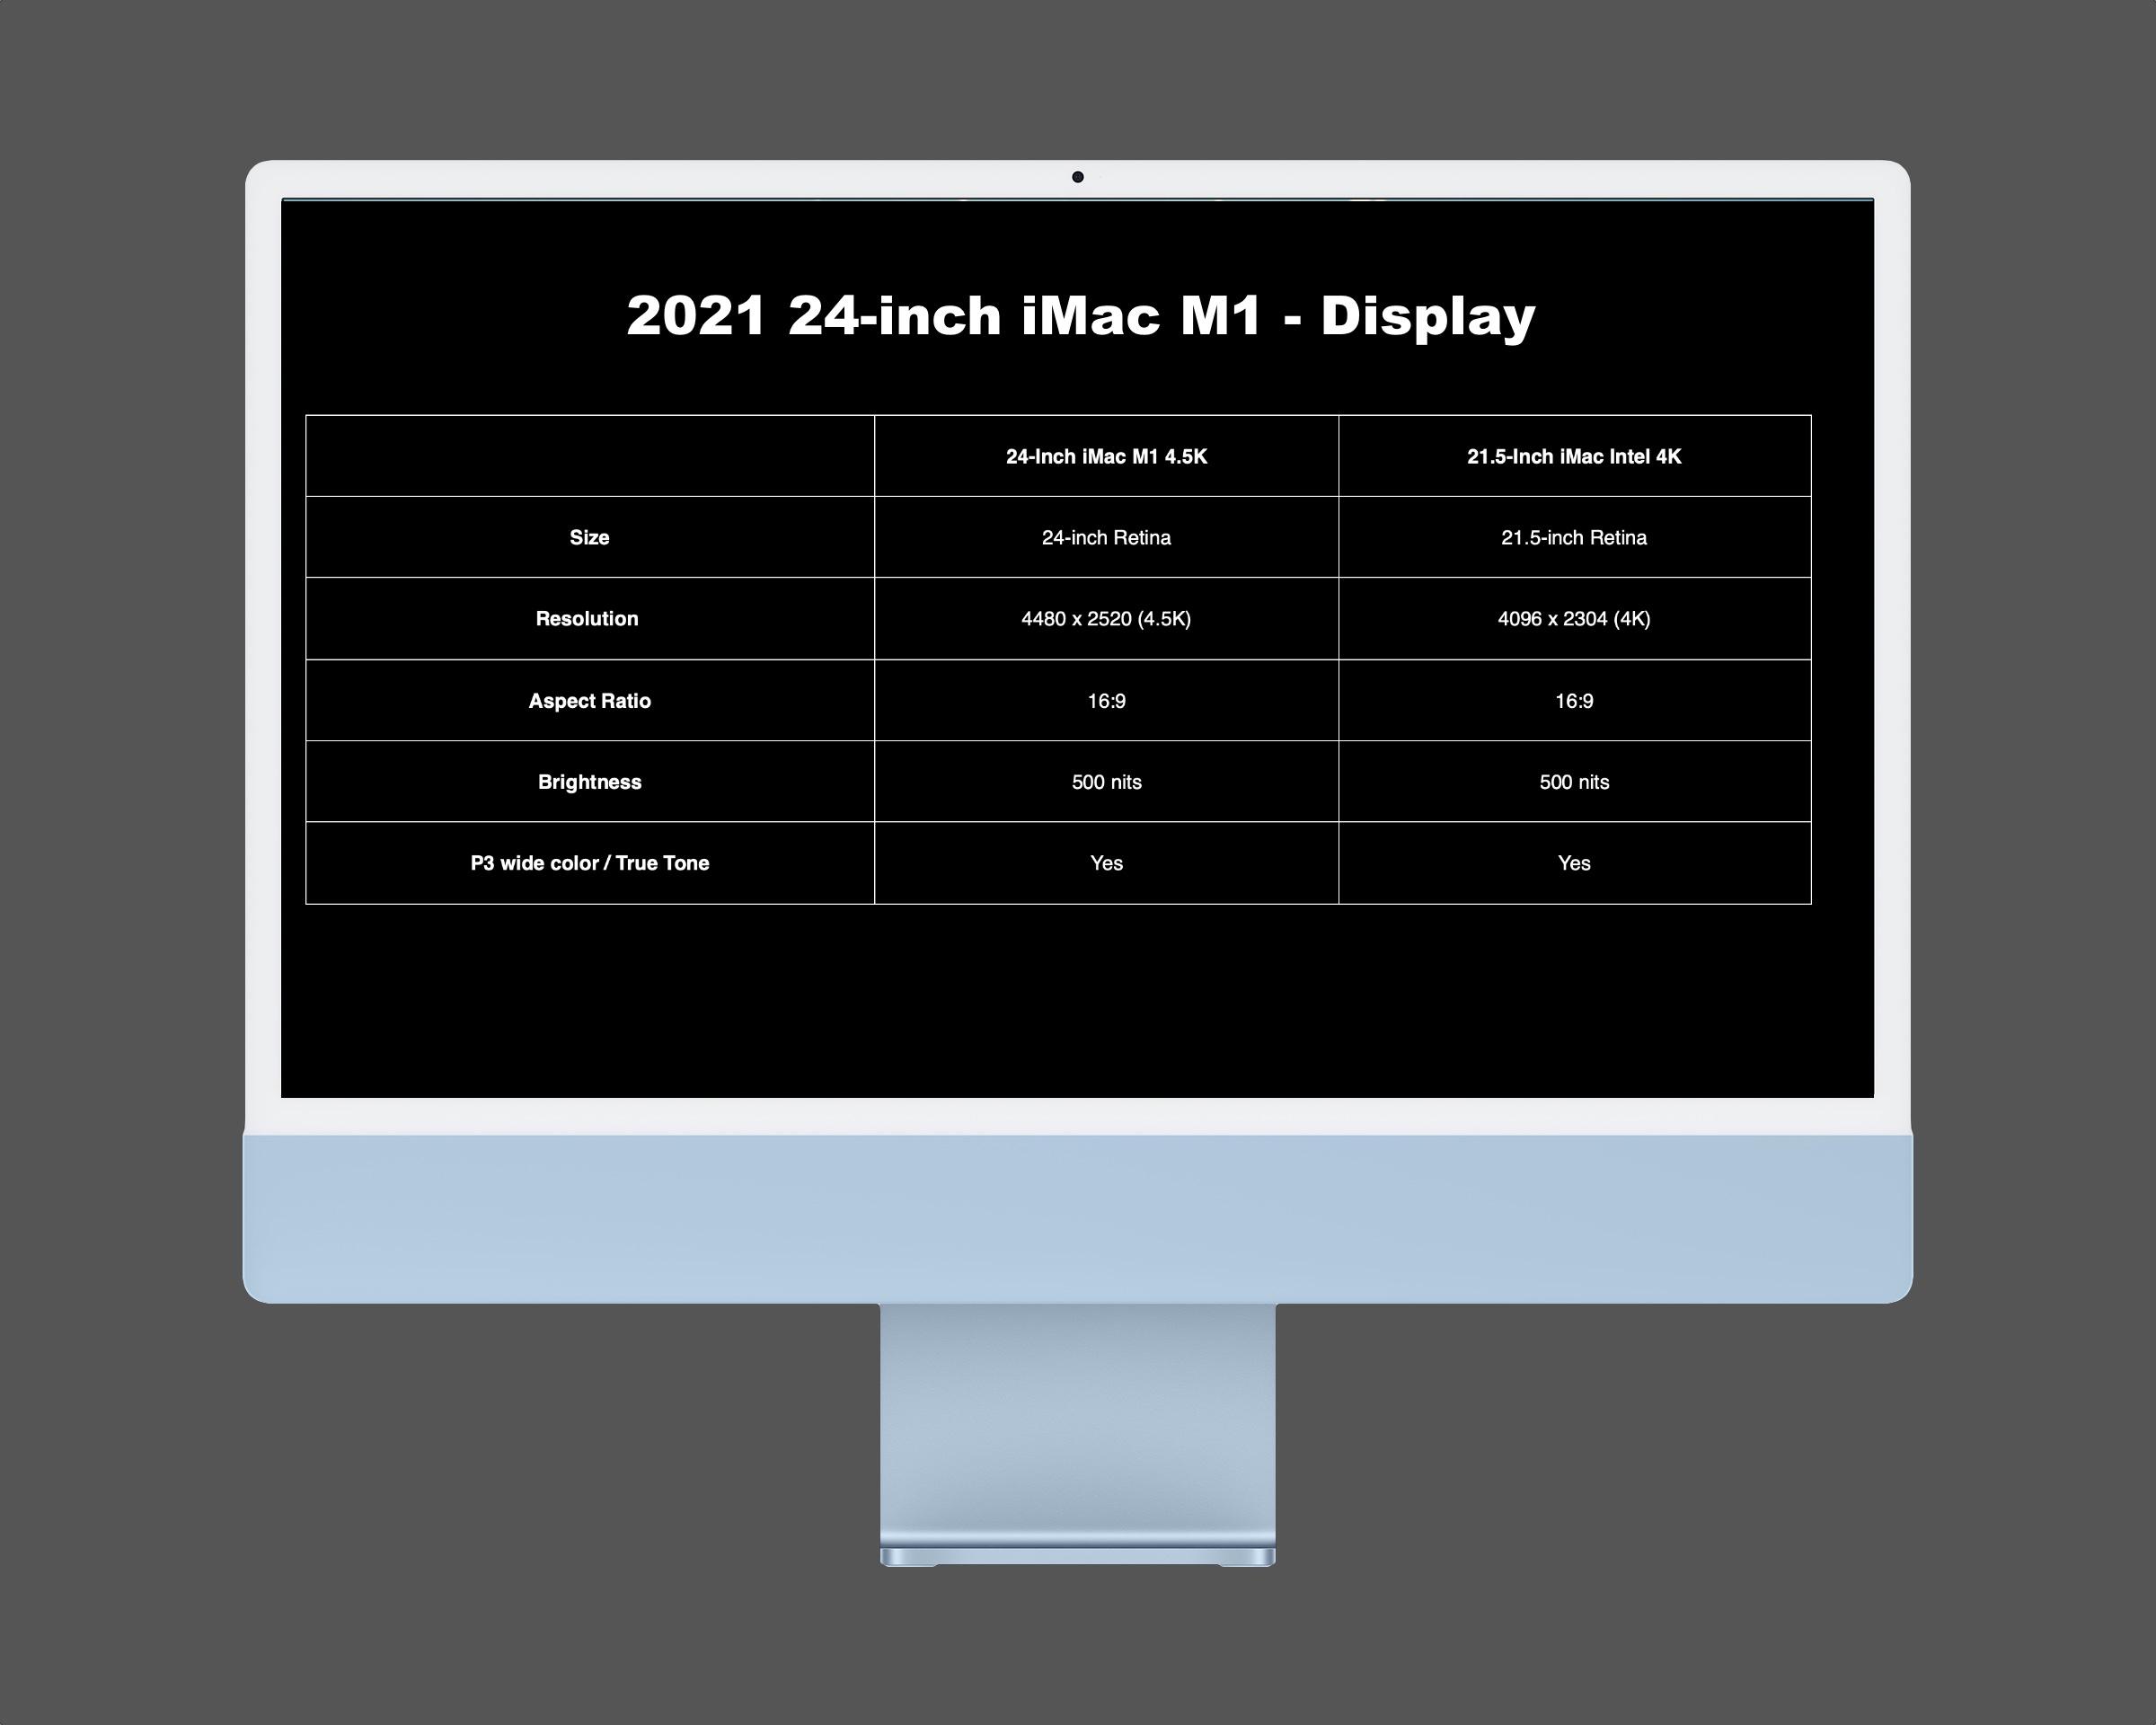 M1 iMac vs Intel iMac - Hardware